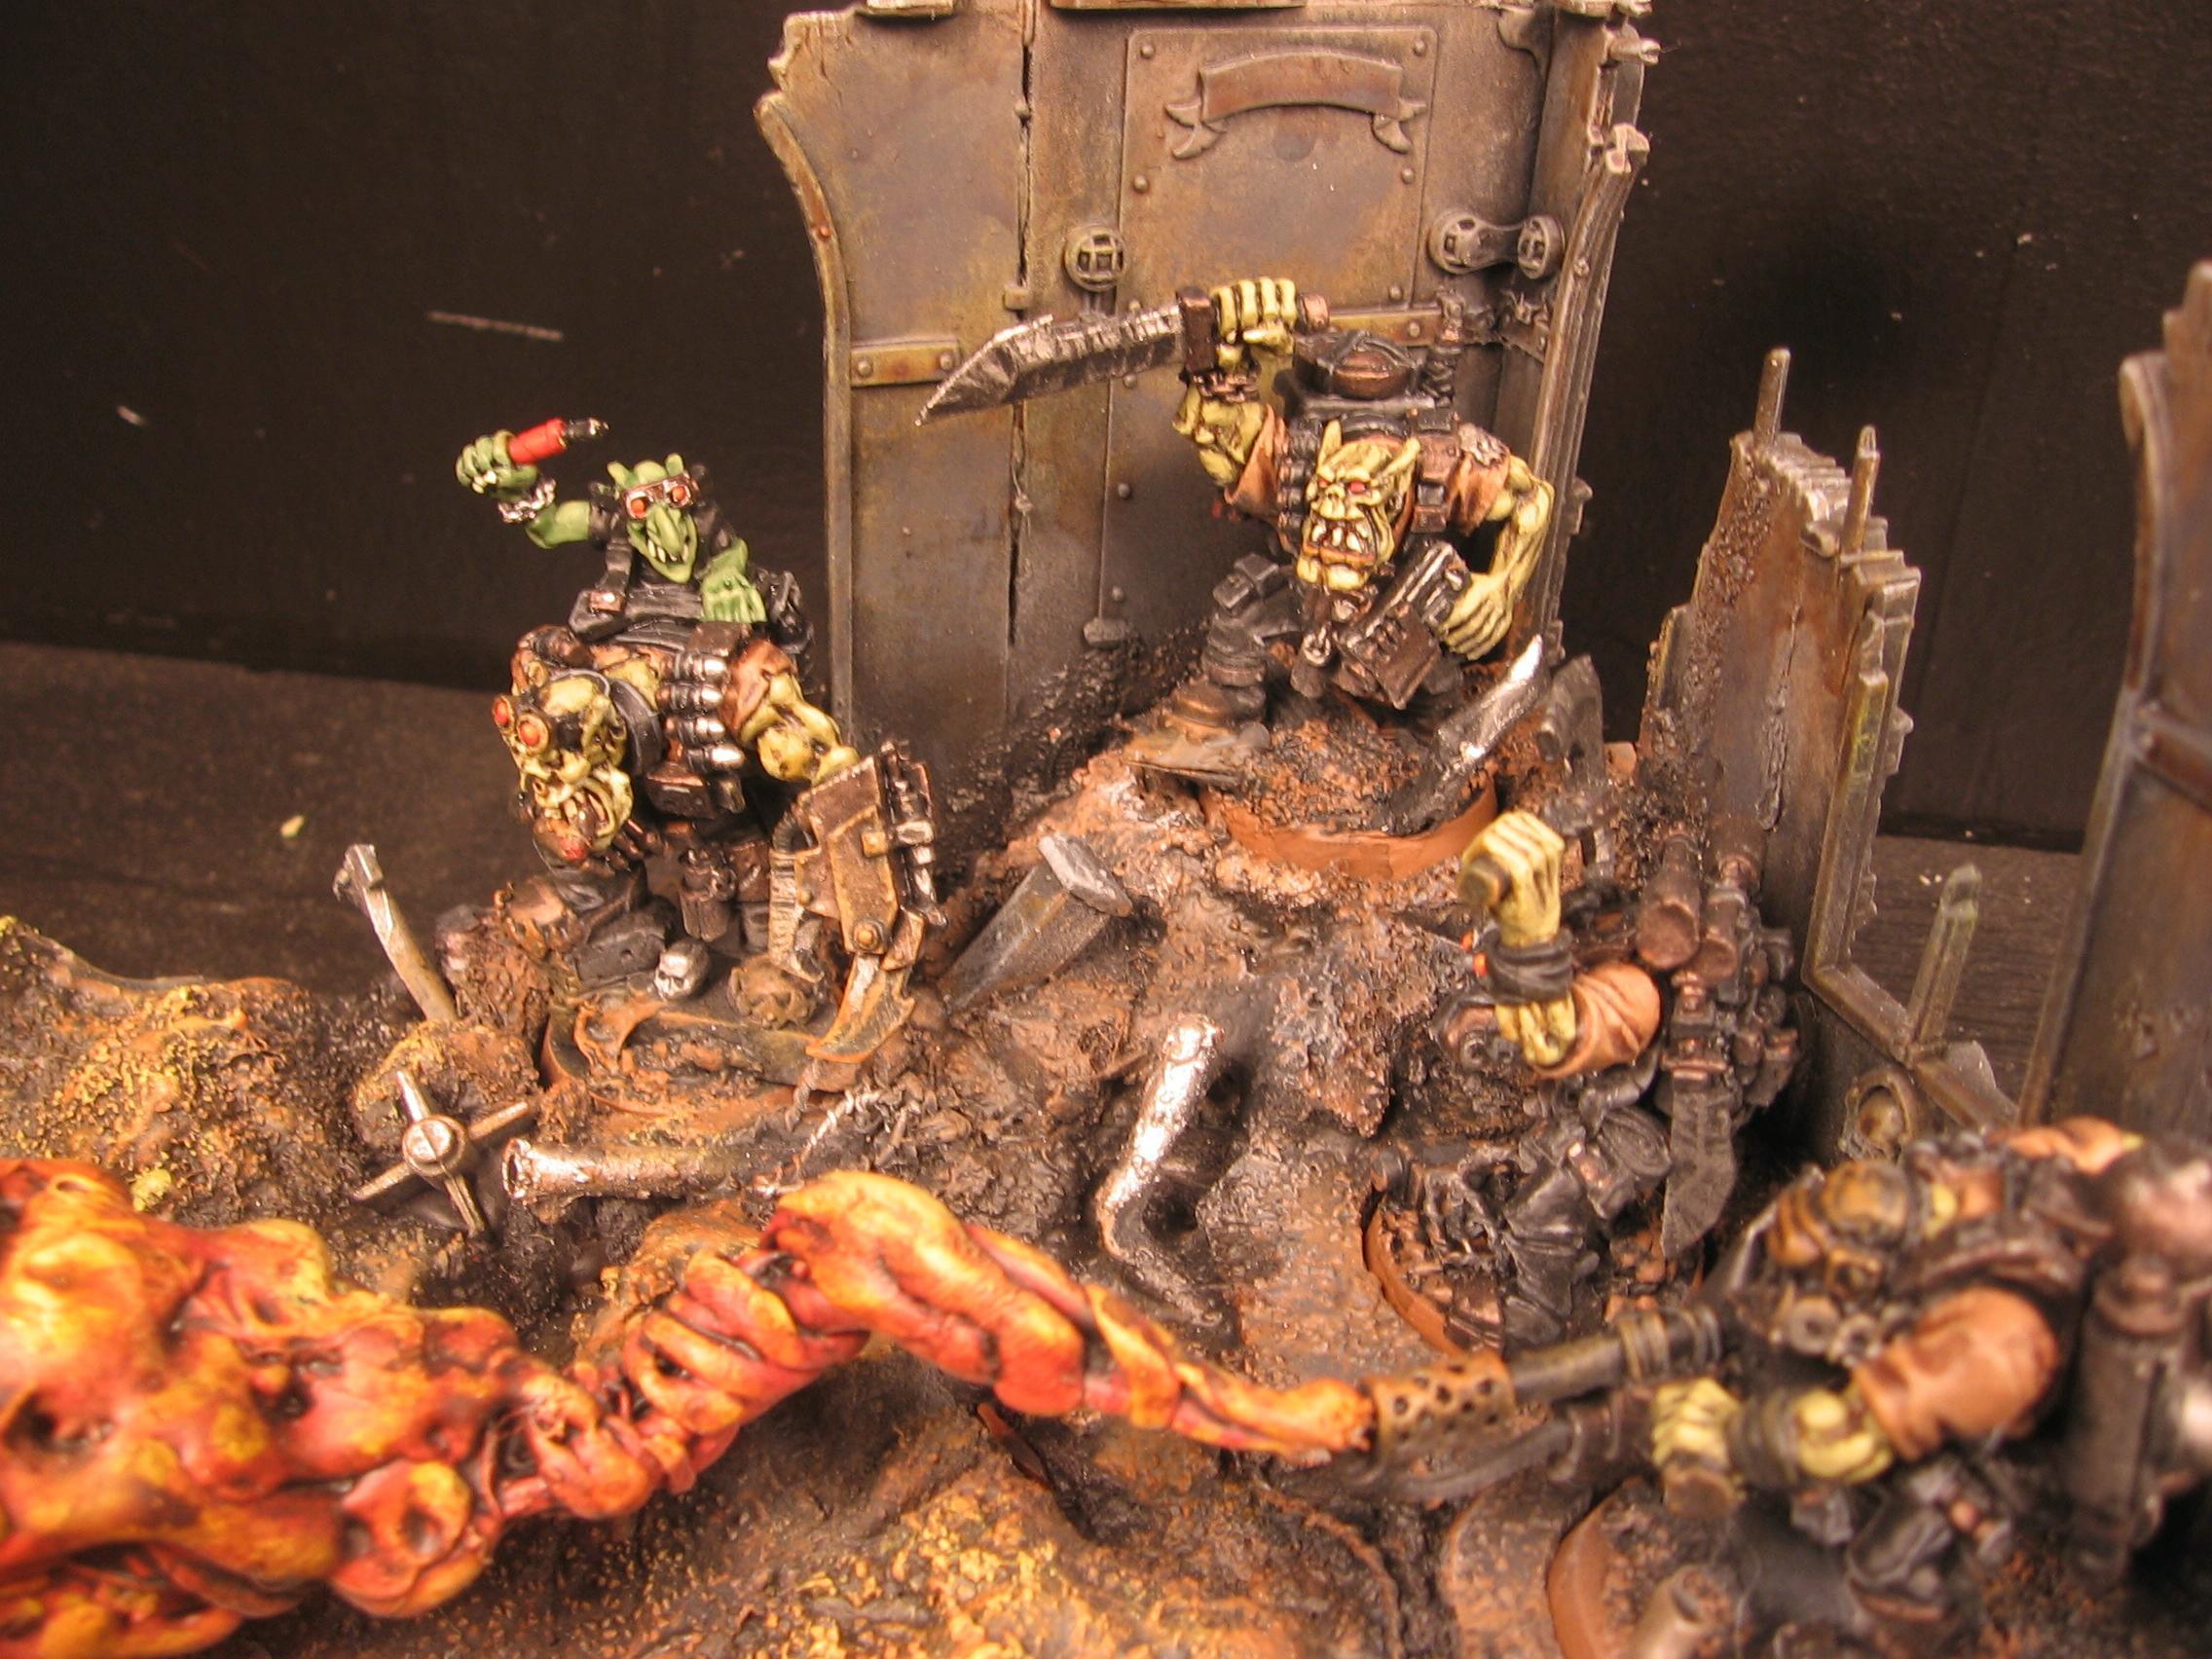 Burna Boyz, Fire, Flamer, Kommandos, Orks, Warhammer 40,000